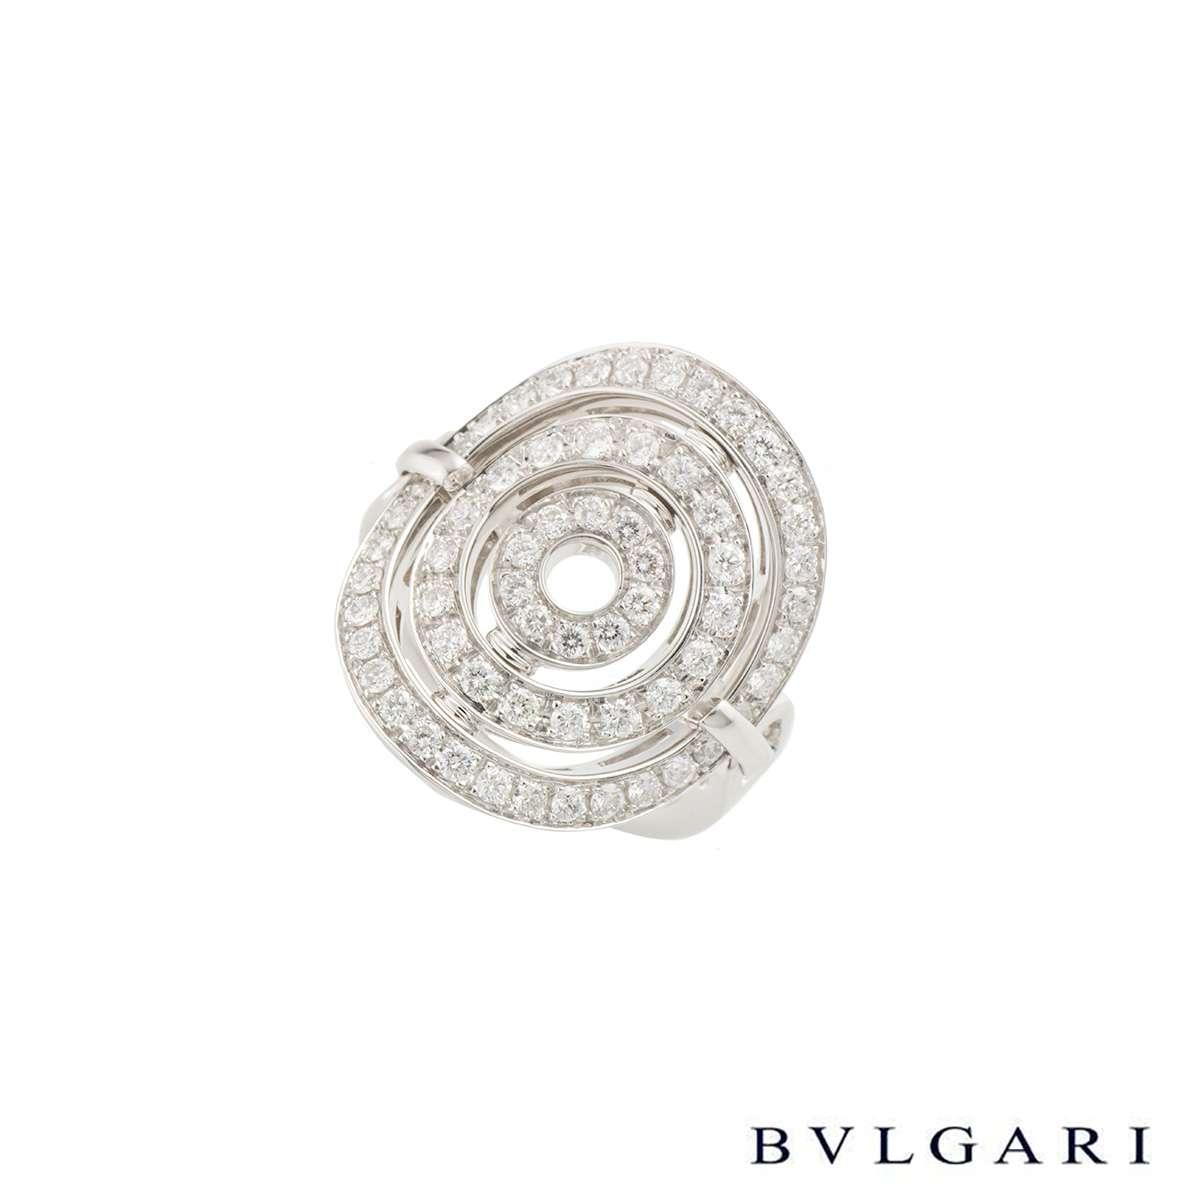 Bvlgari White Gold Diamond Astrale Ring